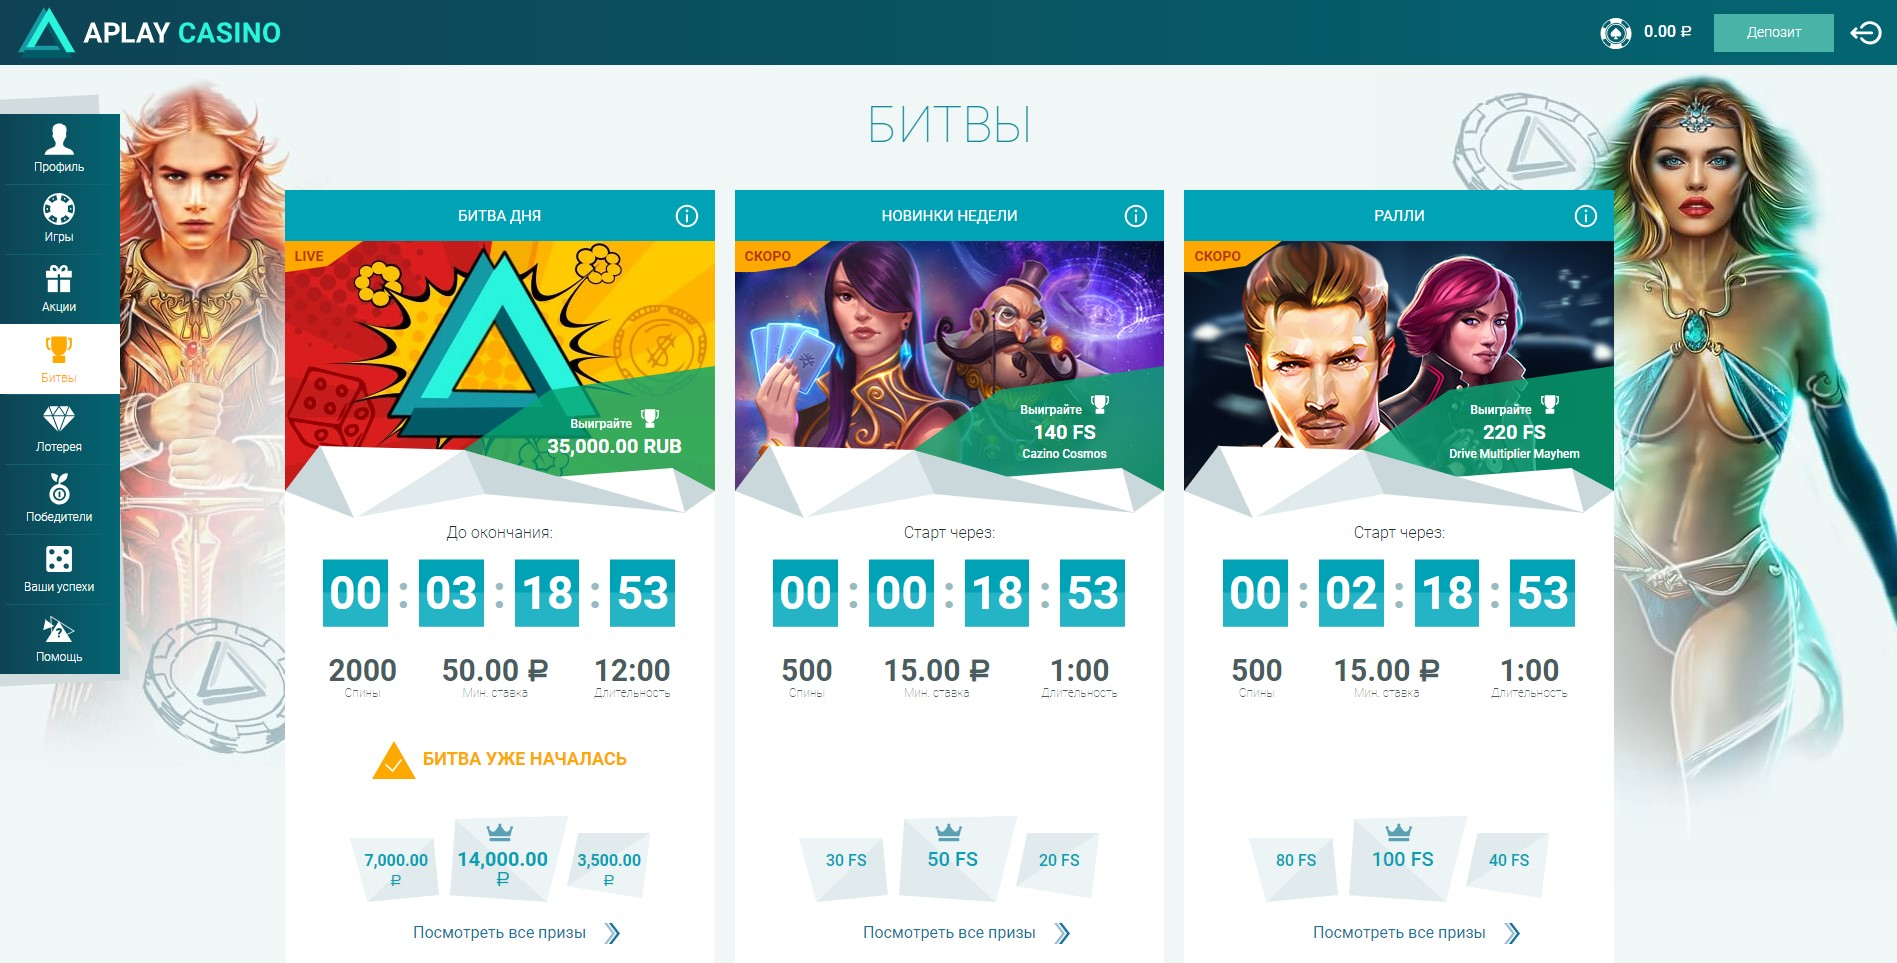 Битвы в онлайн-казино Aplay Casino